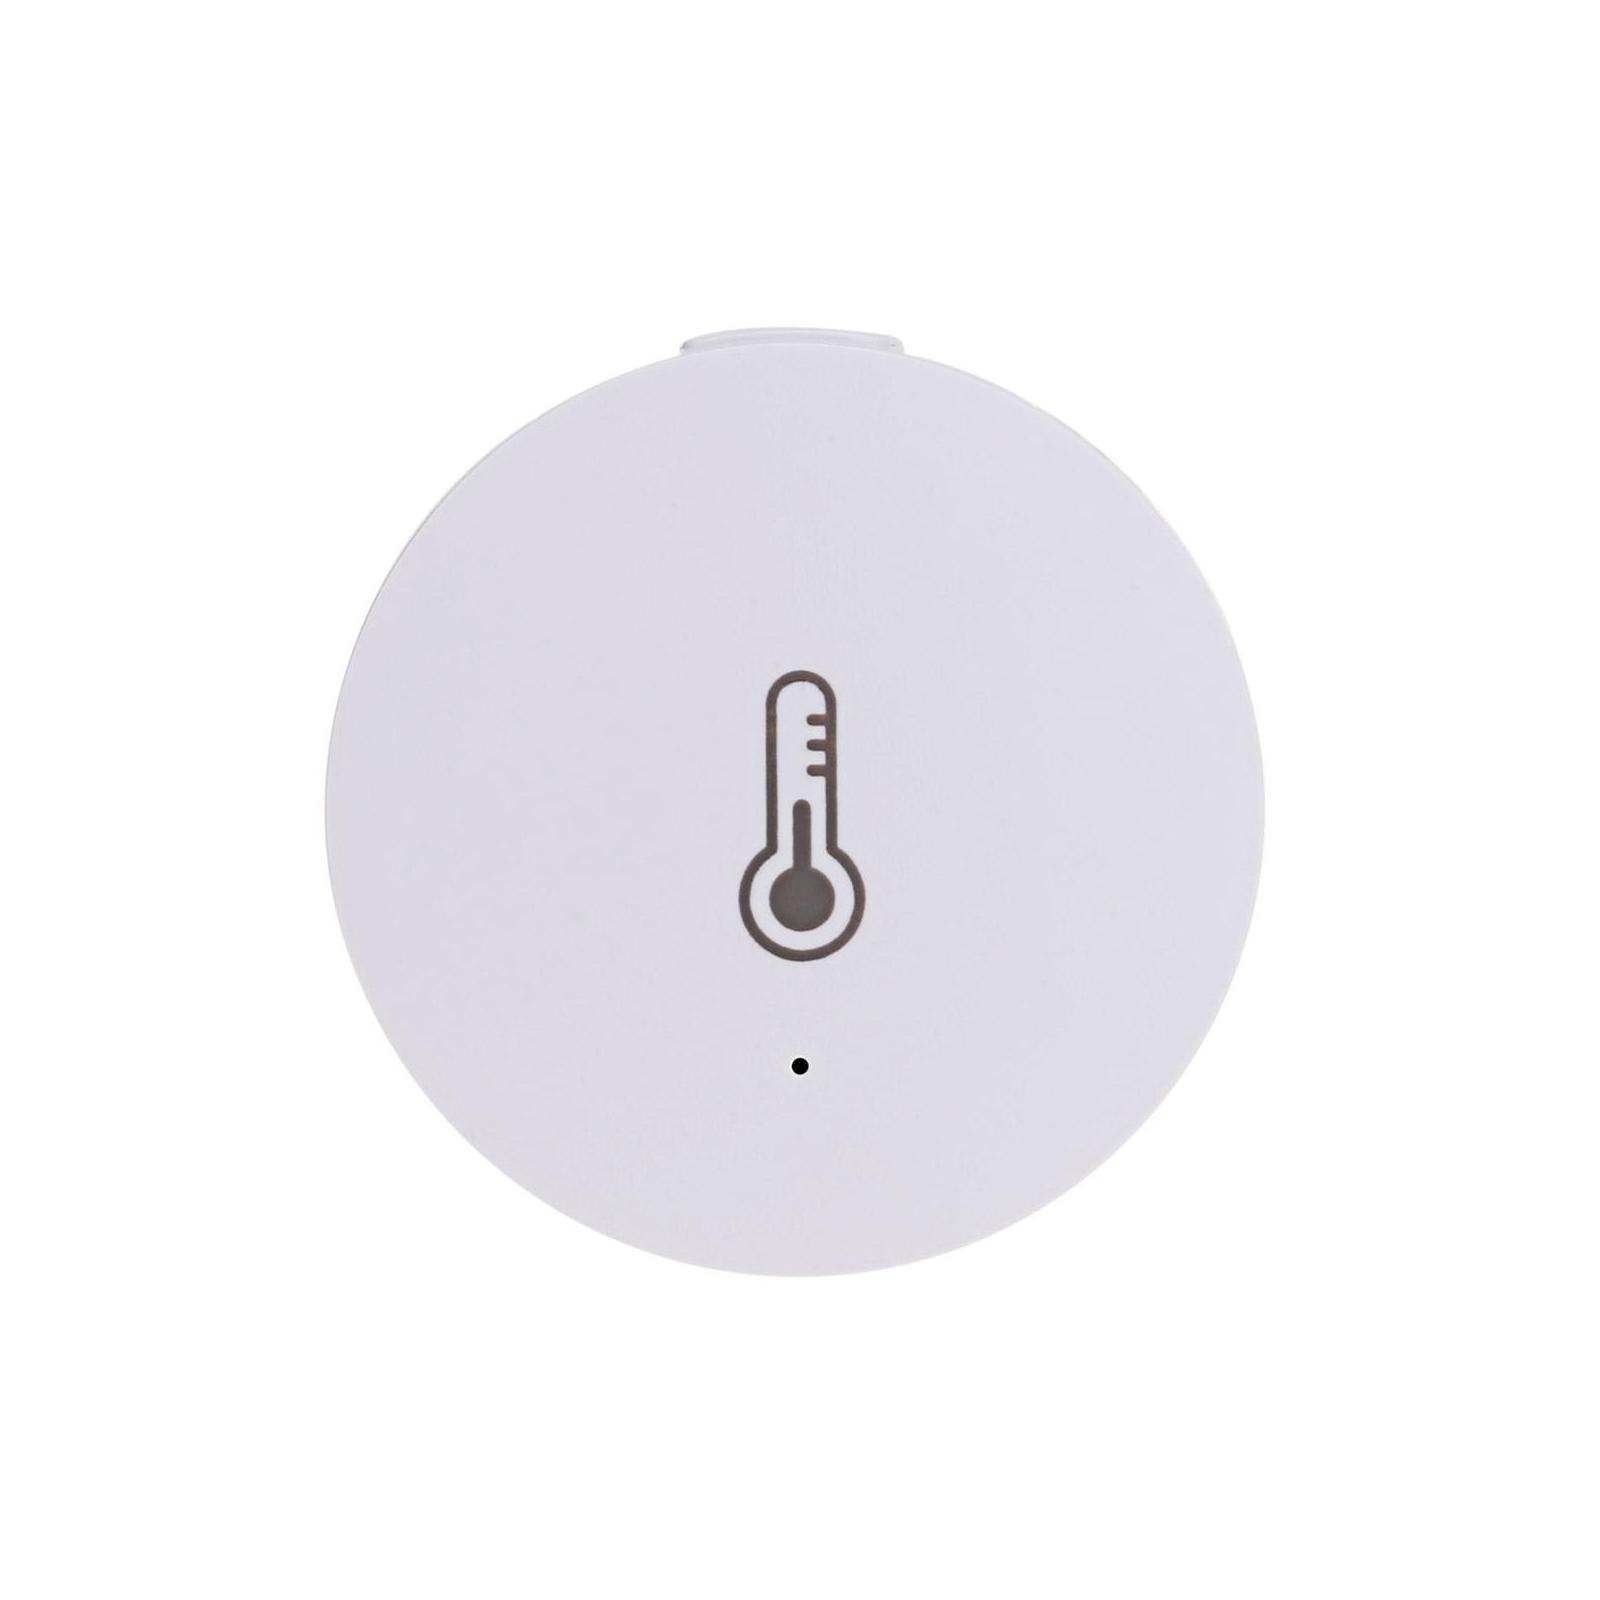 Датчик температуры Xiaomi Mijia Temperature and Humidity Sensor (YTC4018CN)